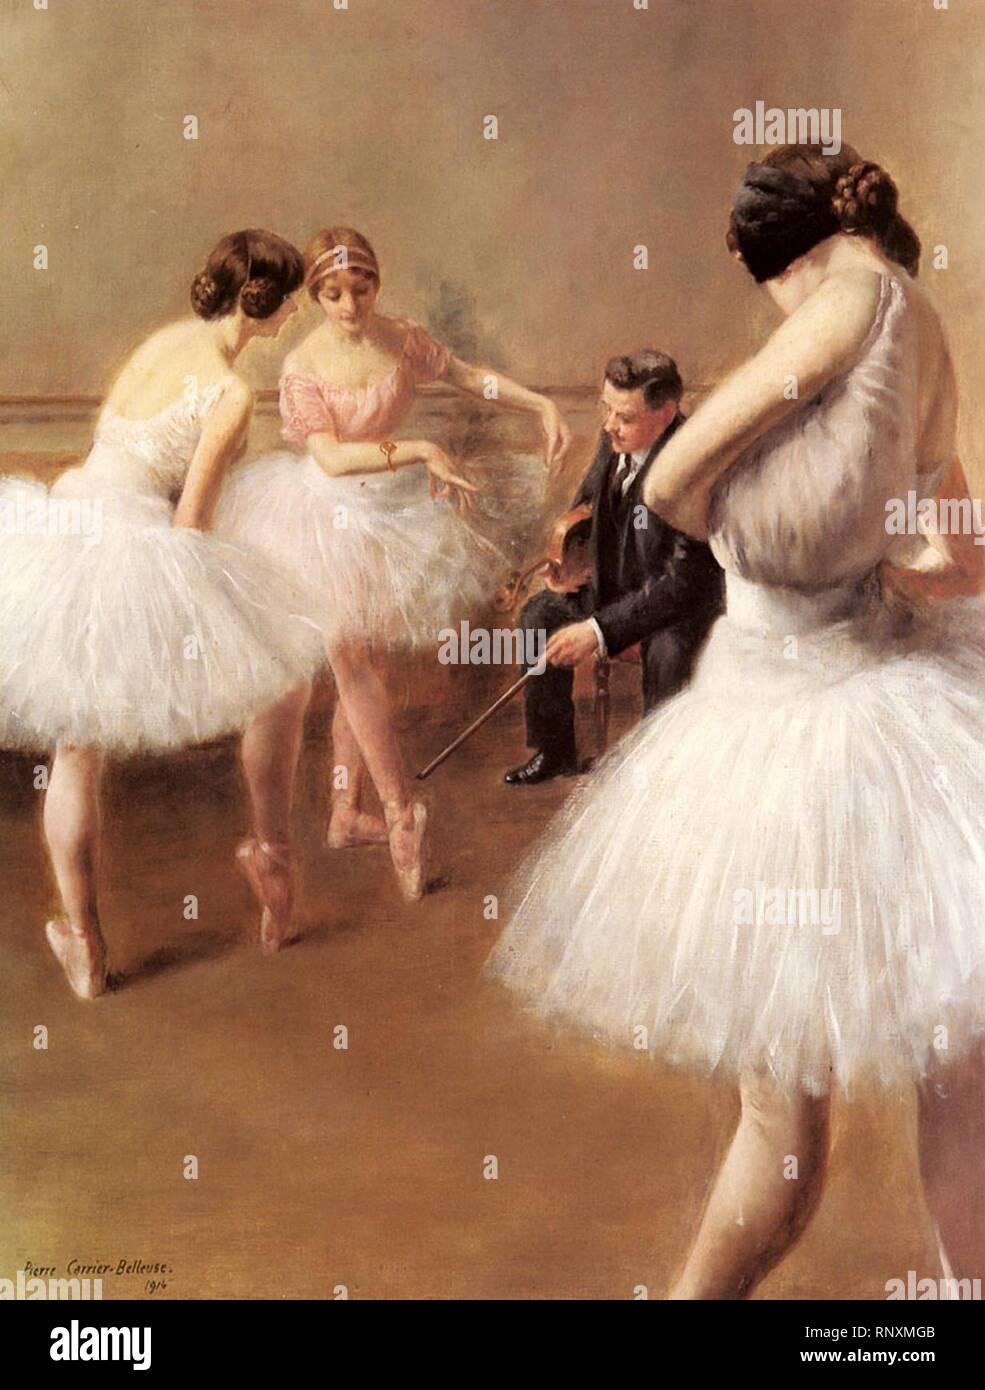 Carrier Belleuse Pierre The Ballet Lesson. Stock Photo